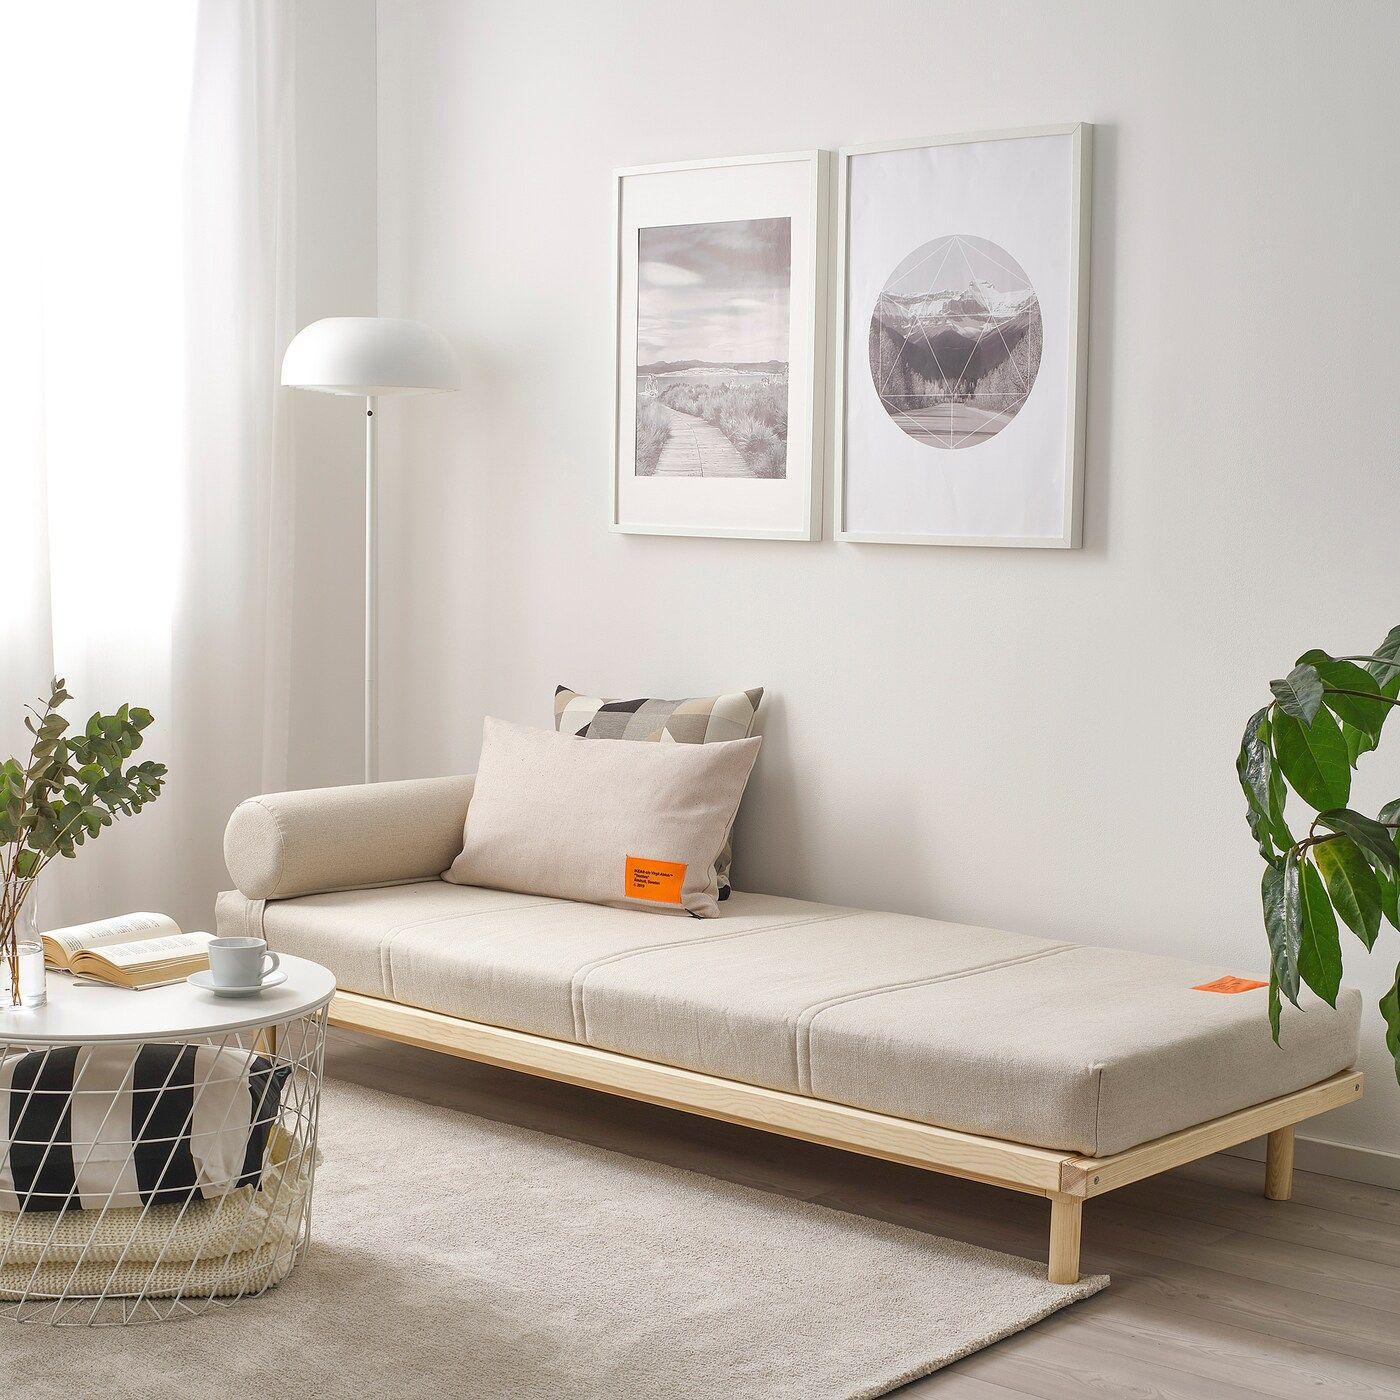 Best Stylecaster Ikea Black Friday 2019 Deals Home Decor 400 x 300